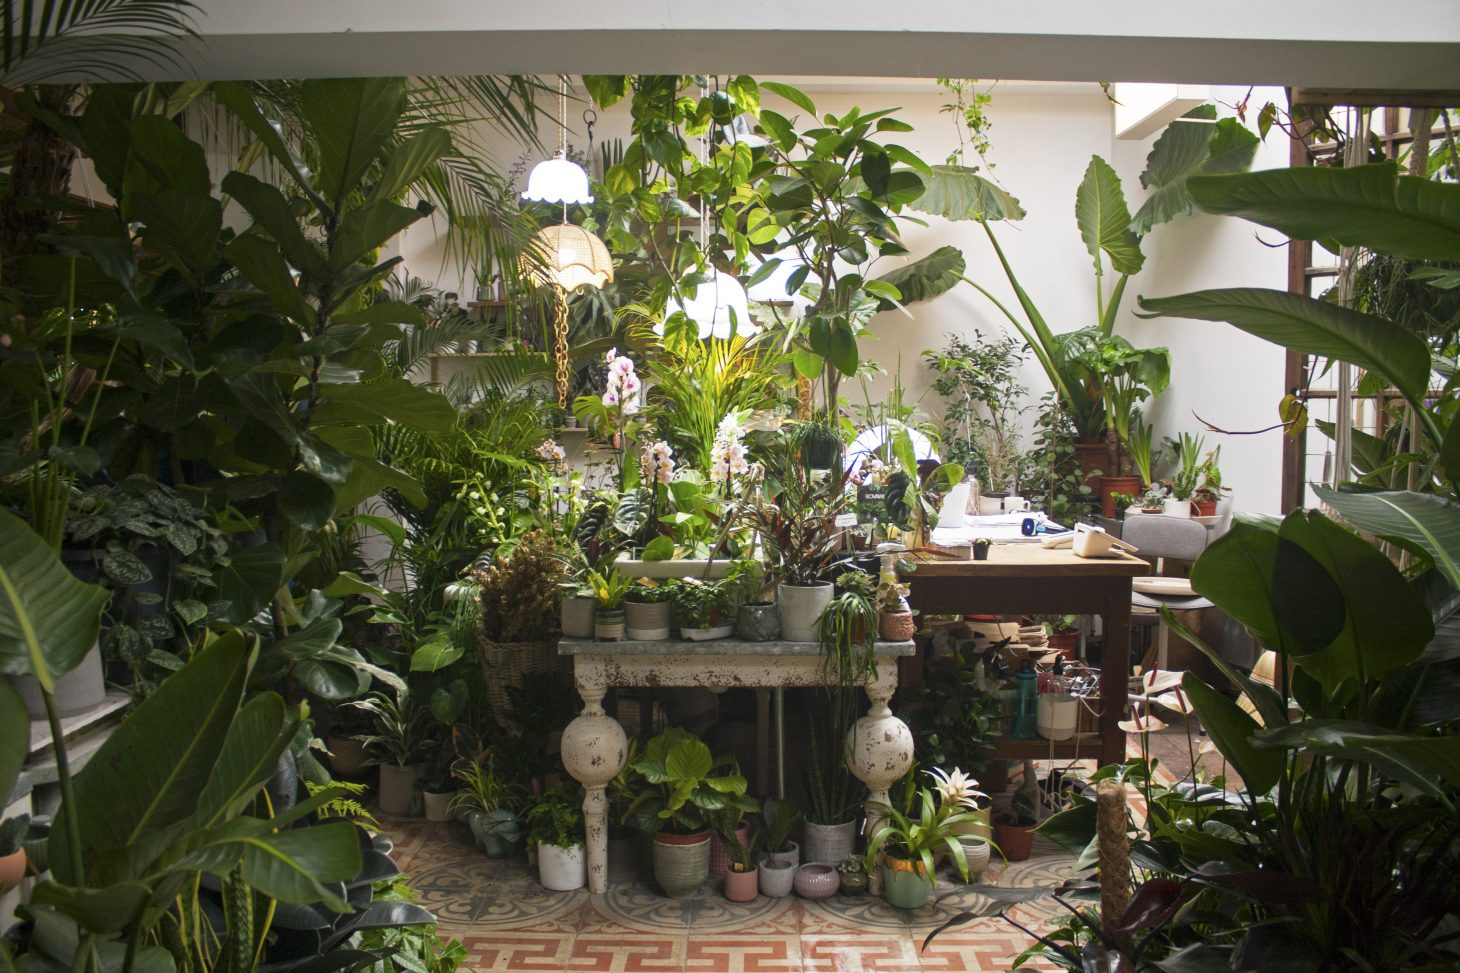 Conservatory Archives, Hackney inside